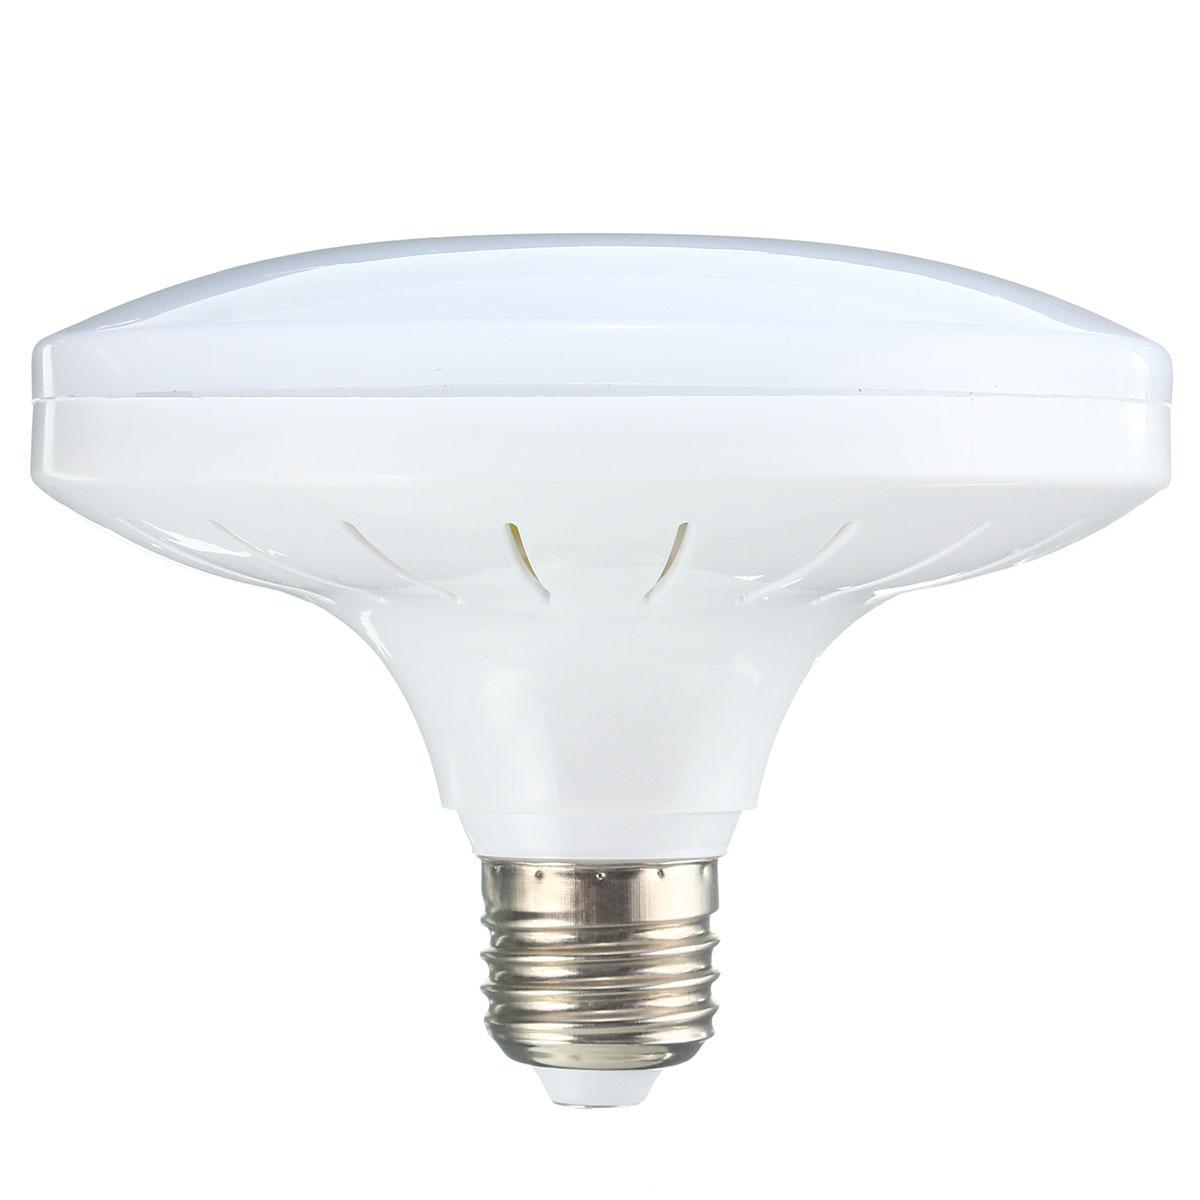 e27 18w 36 smd 5730 led cool white saucer globe light lamp bulb ac220v. Black Bedroom Furniture Sets. Home Design Ideas